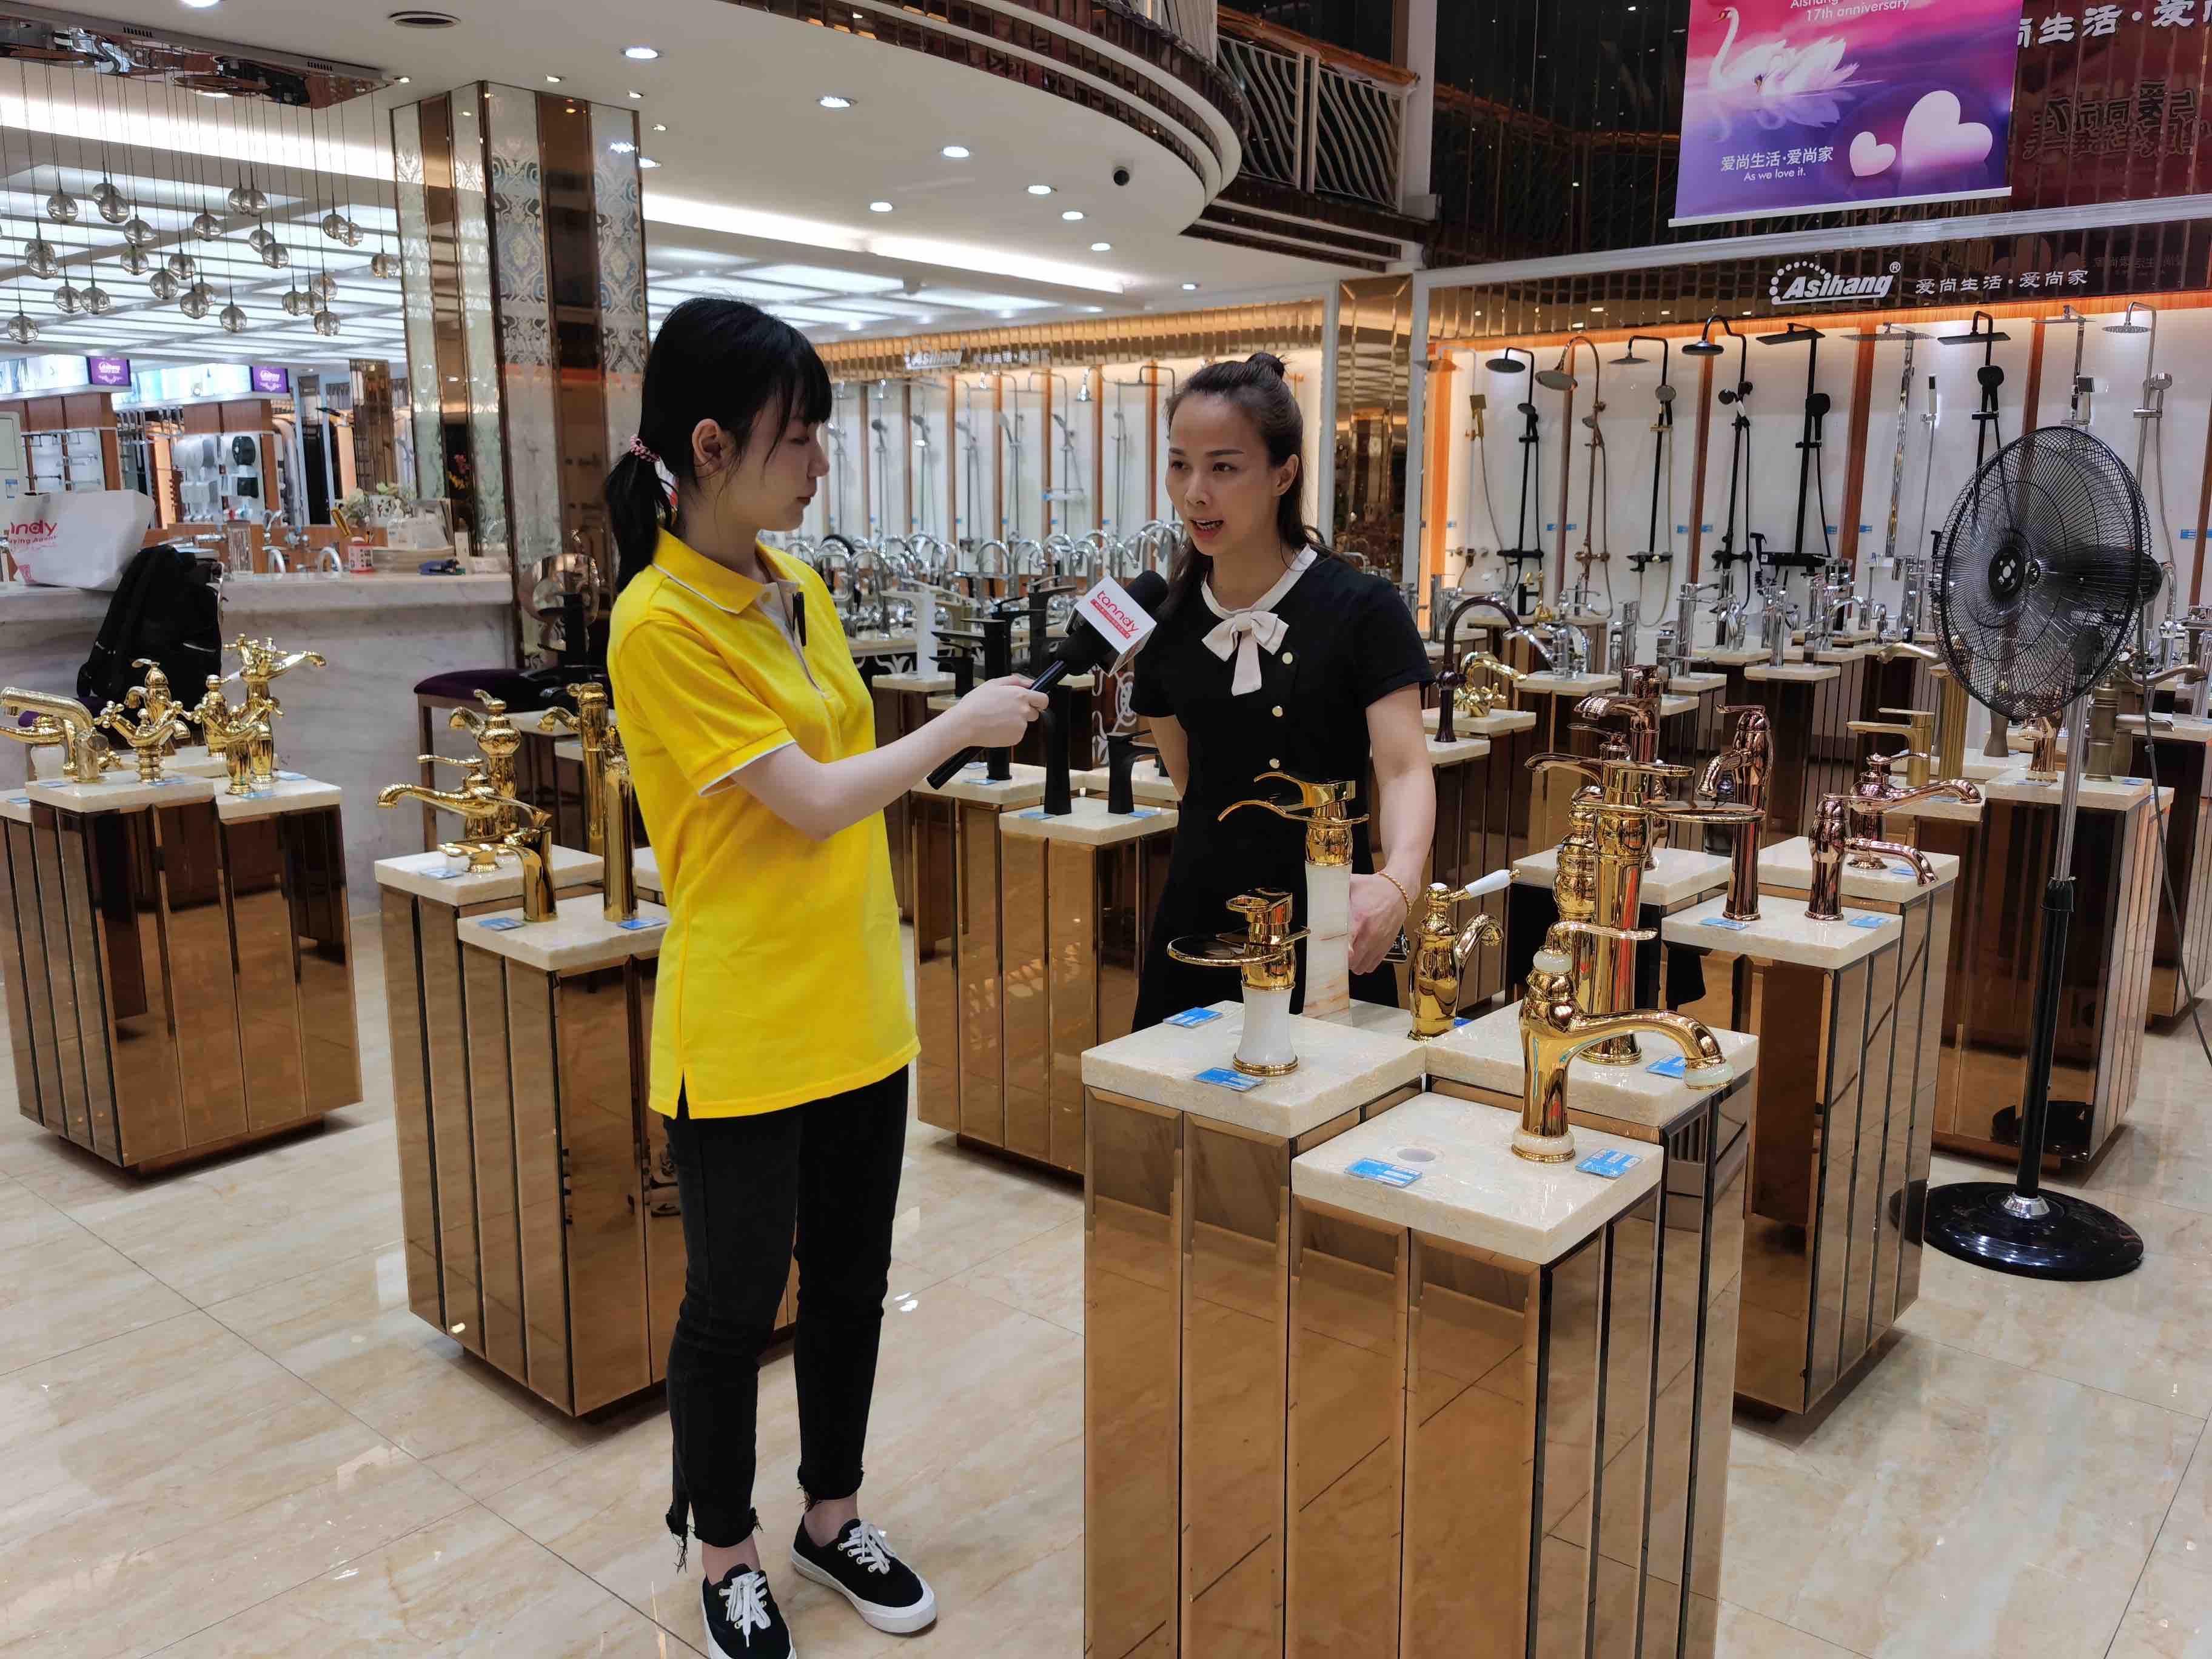 Visiting Sanitary supplier in Foshan